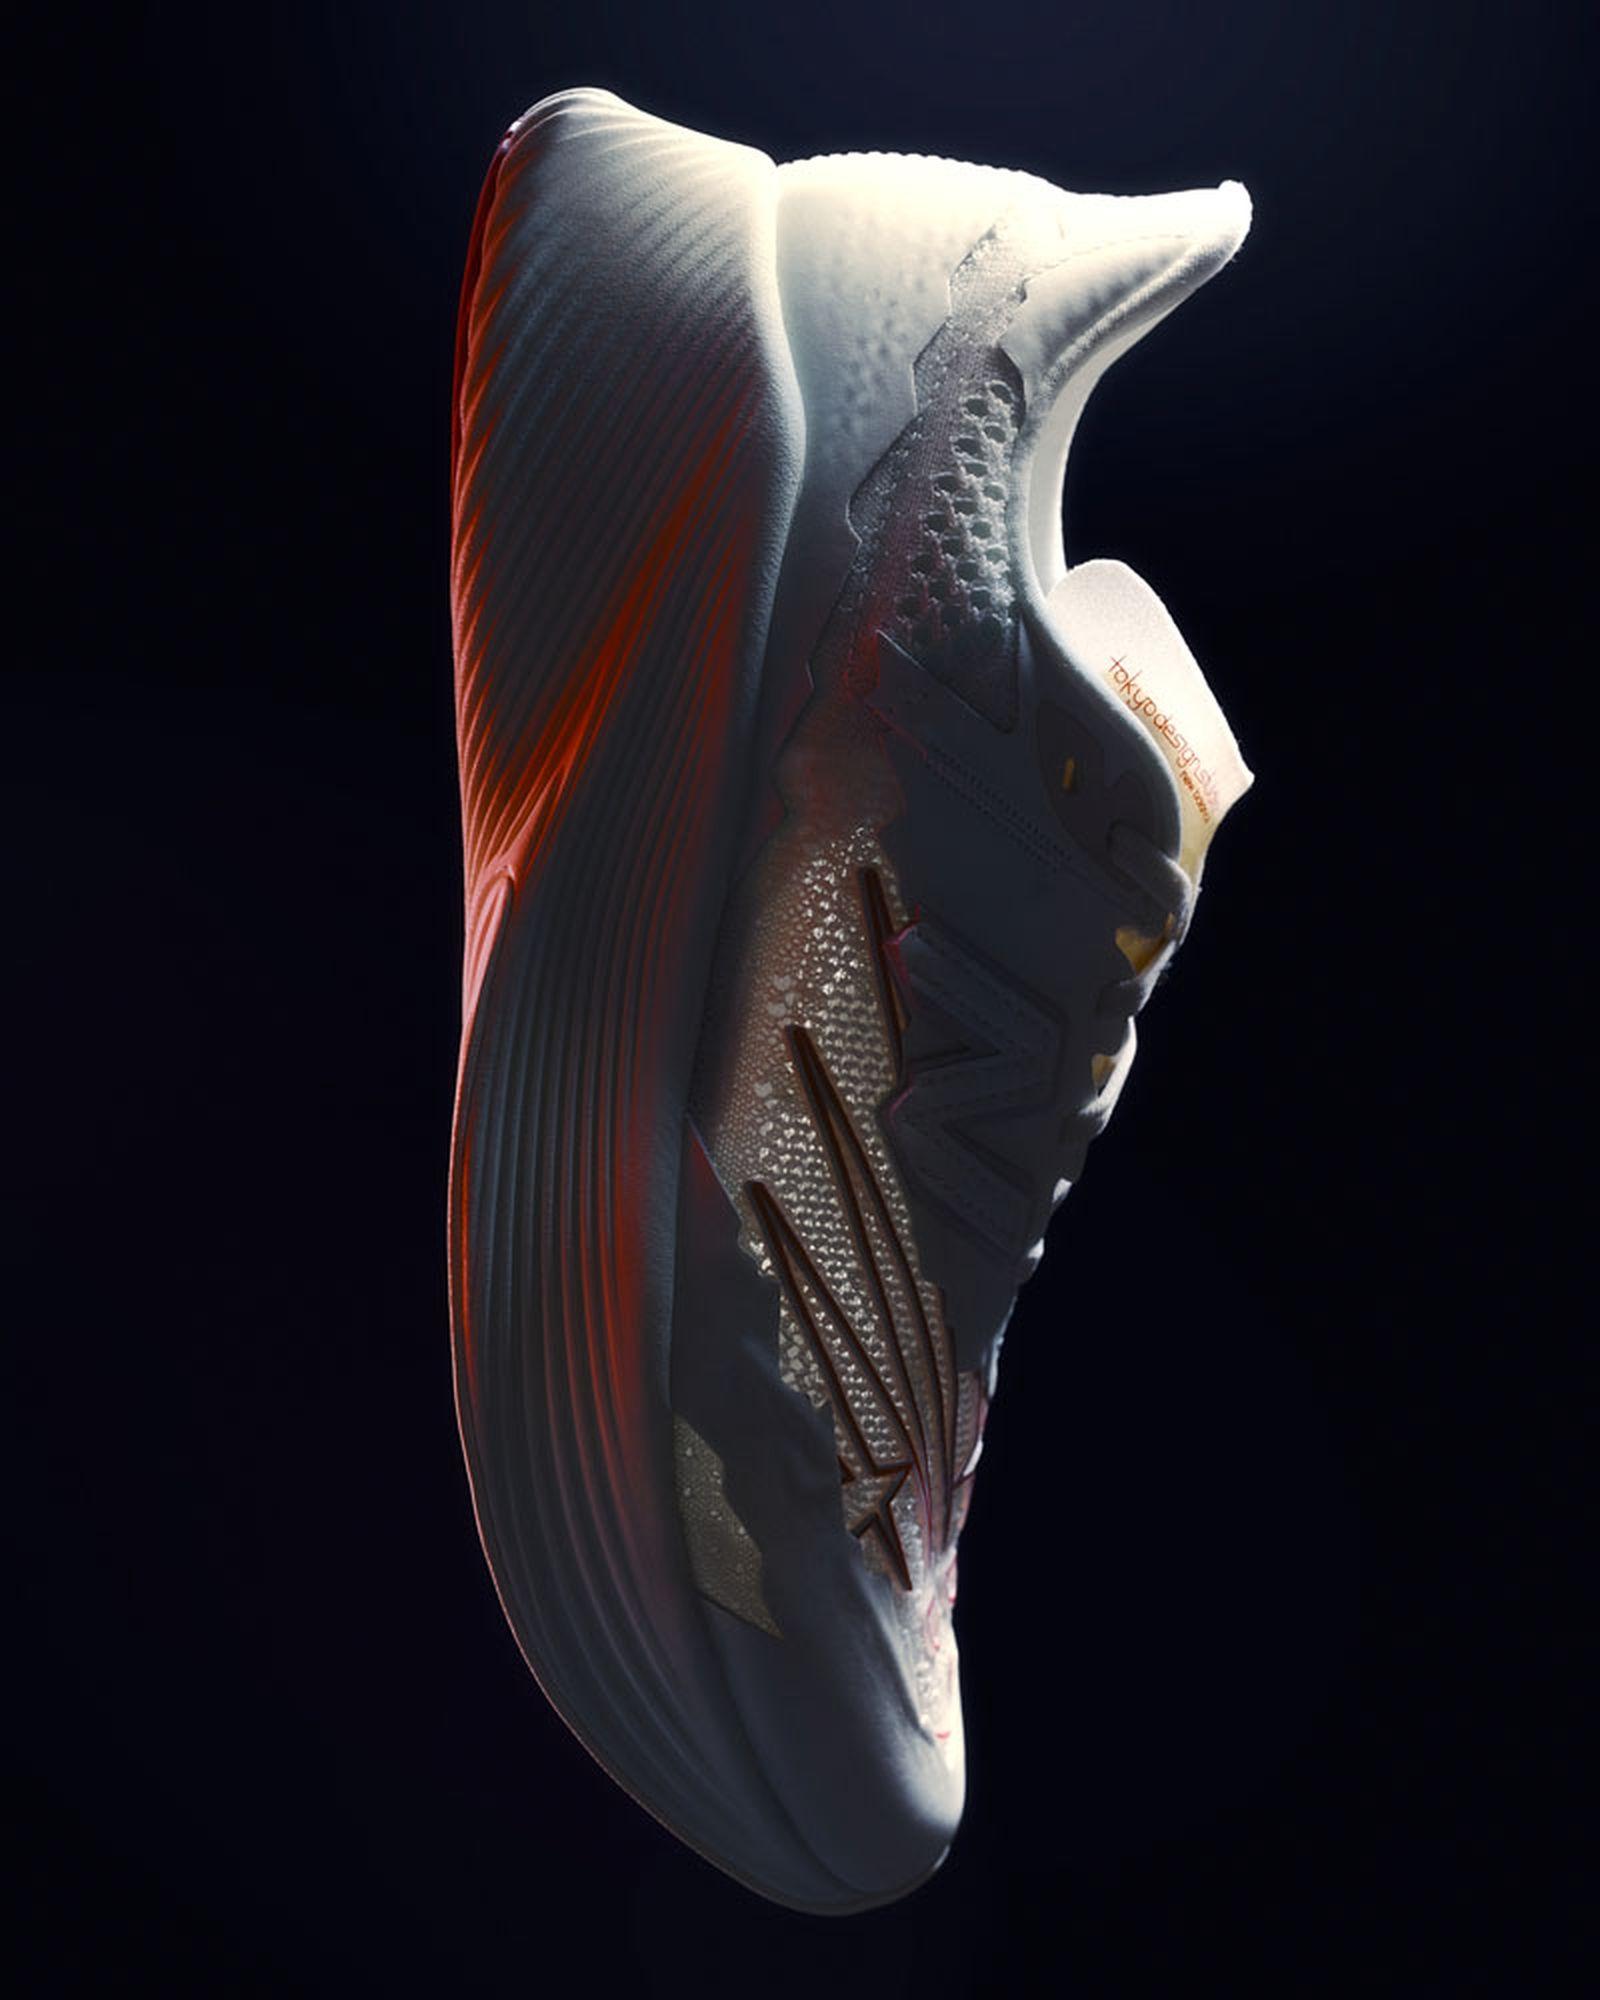 stone-island-new-balance-tds-release-date-02